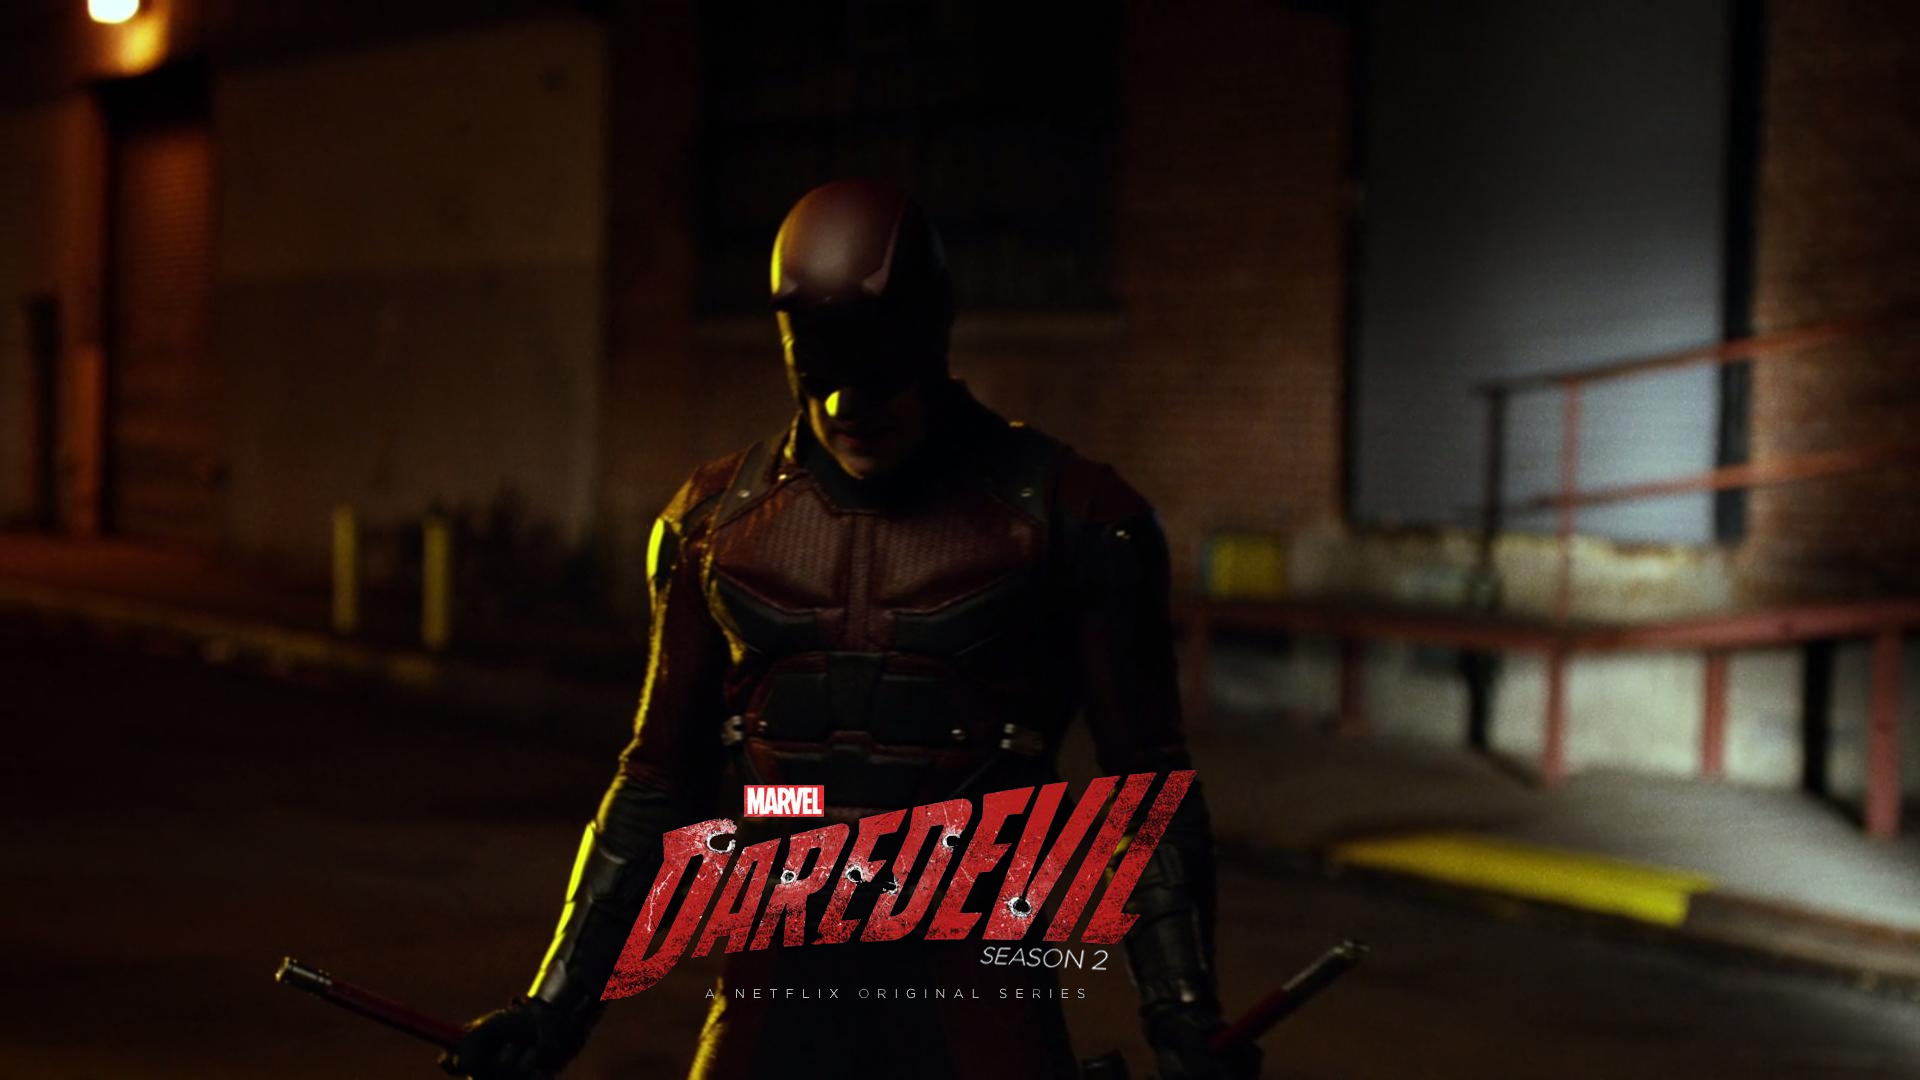 daredevil season 2 wallpaper - photo #18